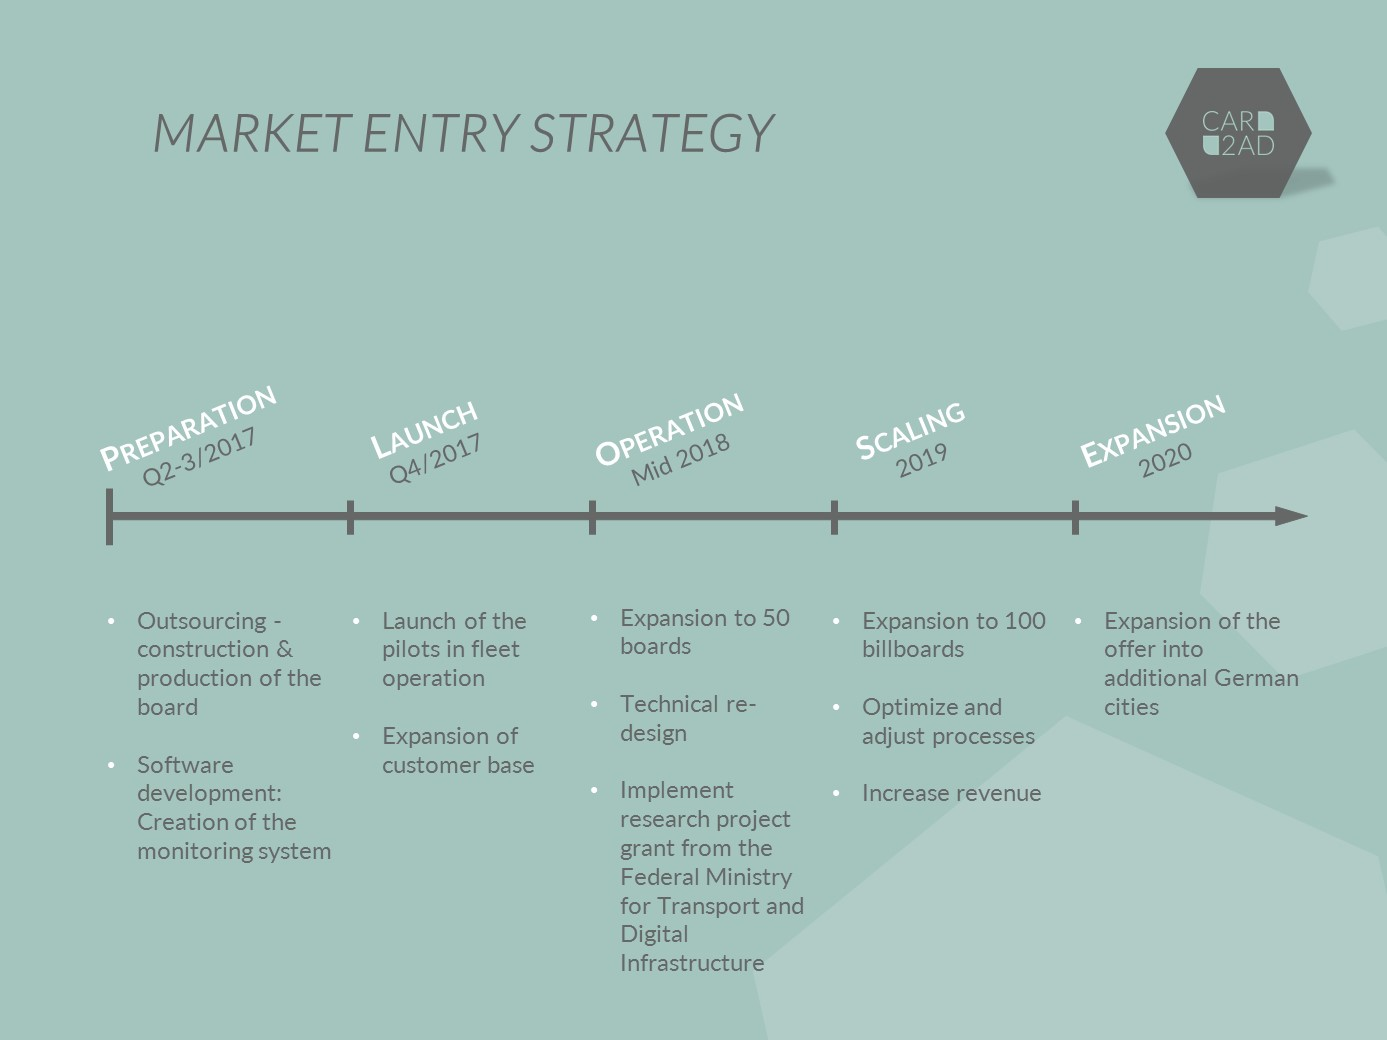 Market Entry Strategy - CAR2AD